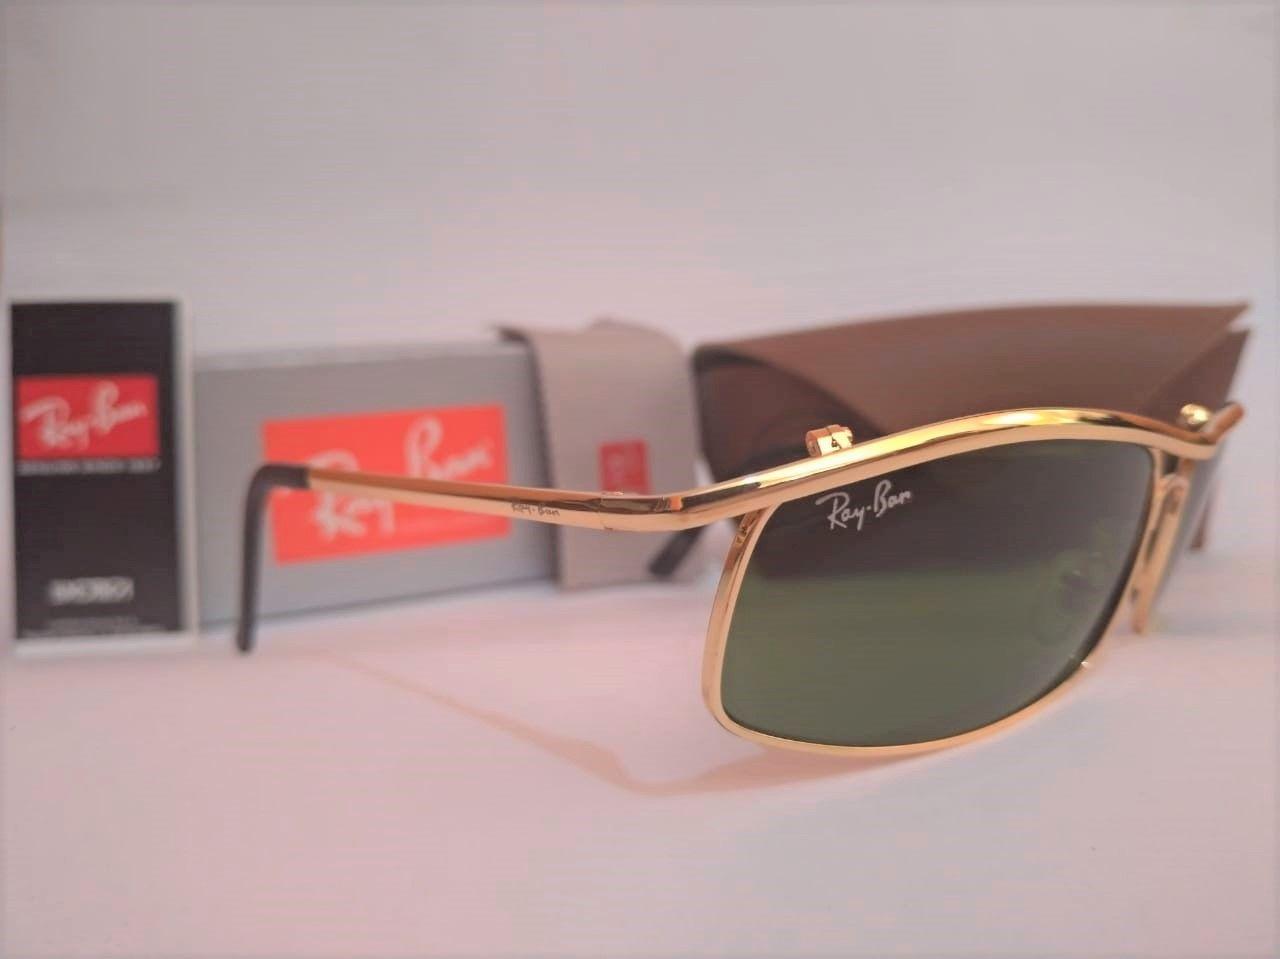 Oculos De Sol Ray Ban Demolidor 3339 Dourado Um Classico Super